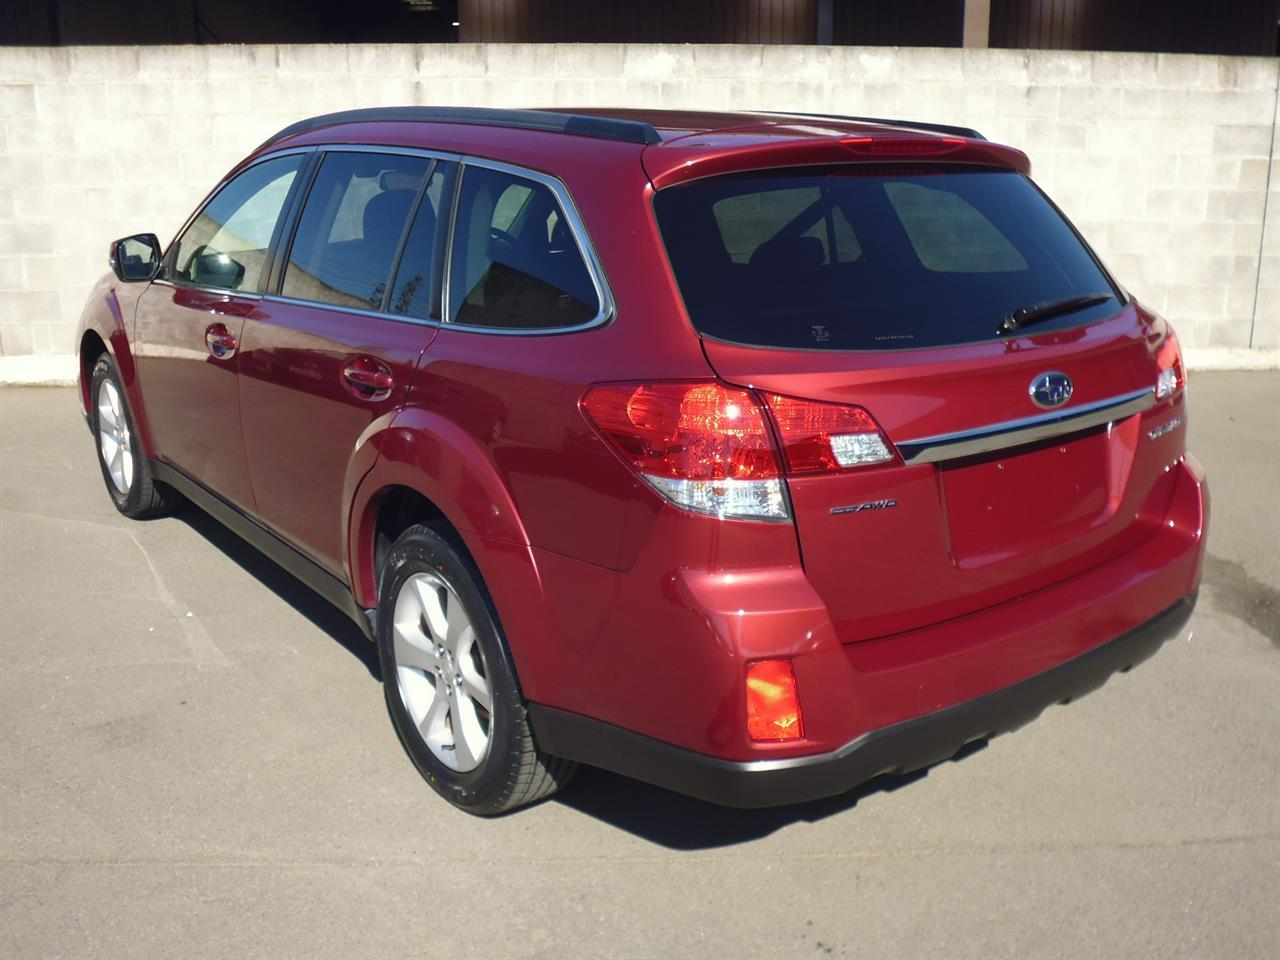 image-3, 2012 Subaru Outback 2.5i Eyesight at Christchurch